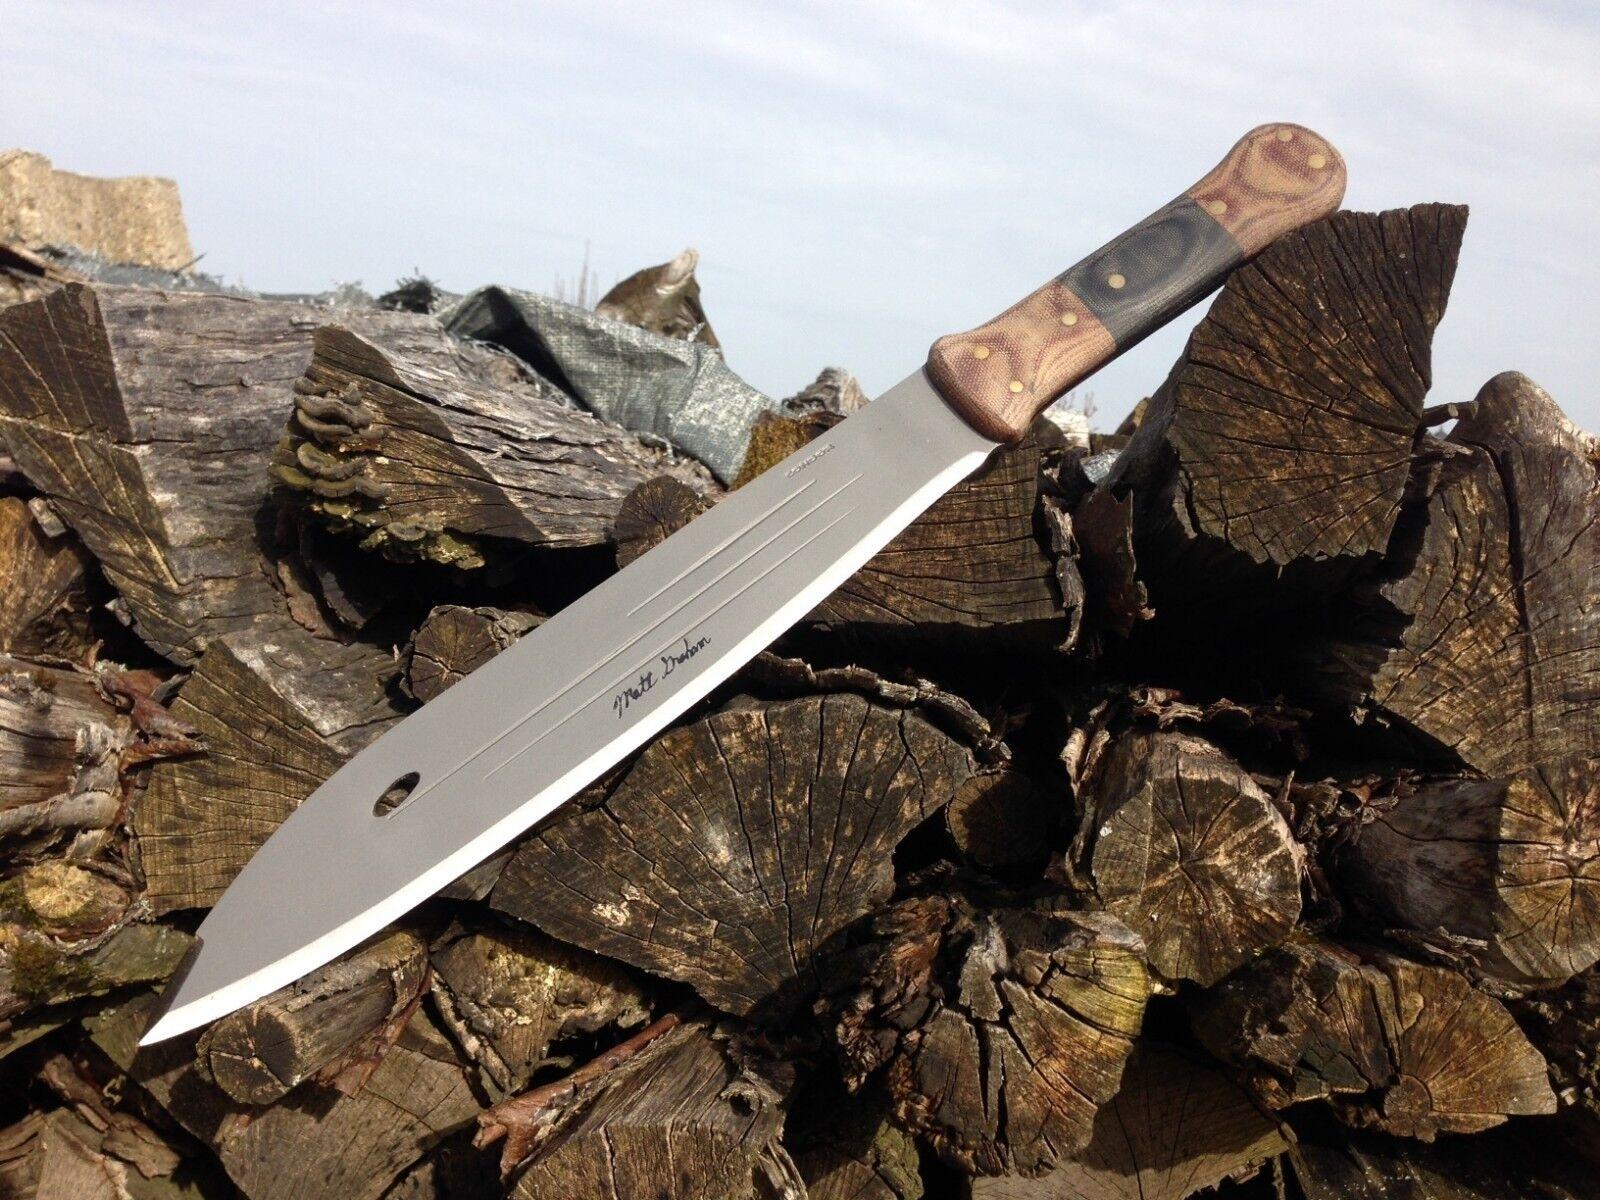 Condor primitive Bush machete Machete coctk 3902-12hc